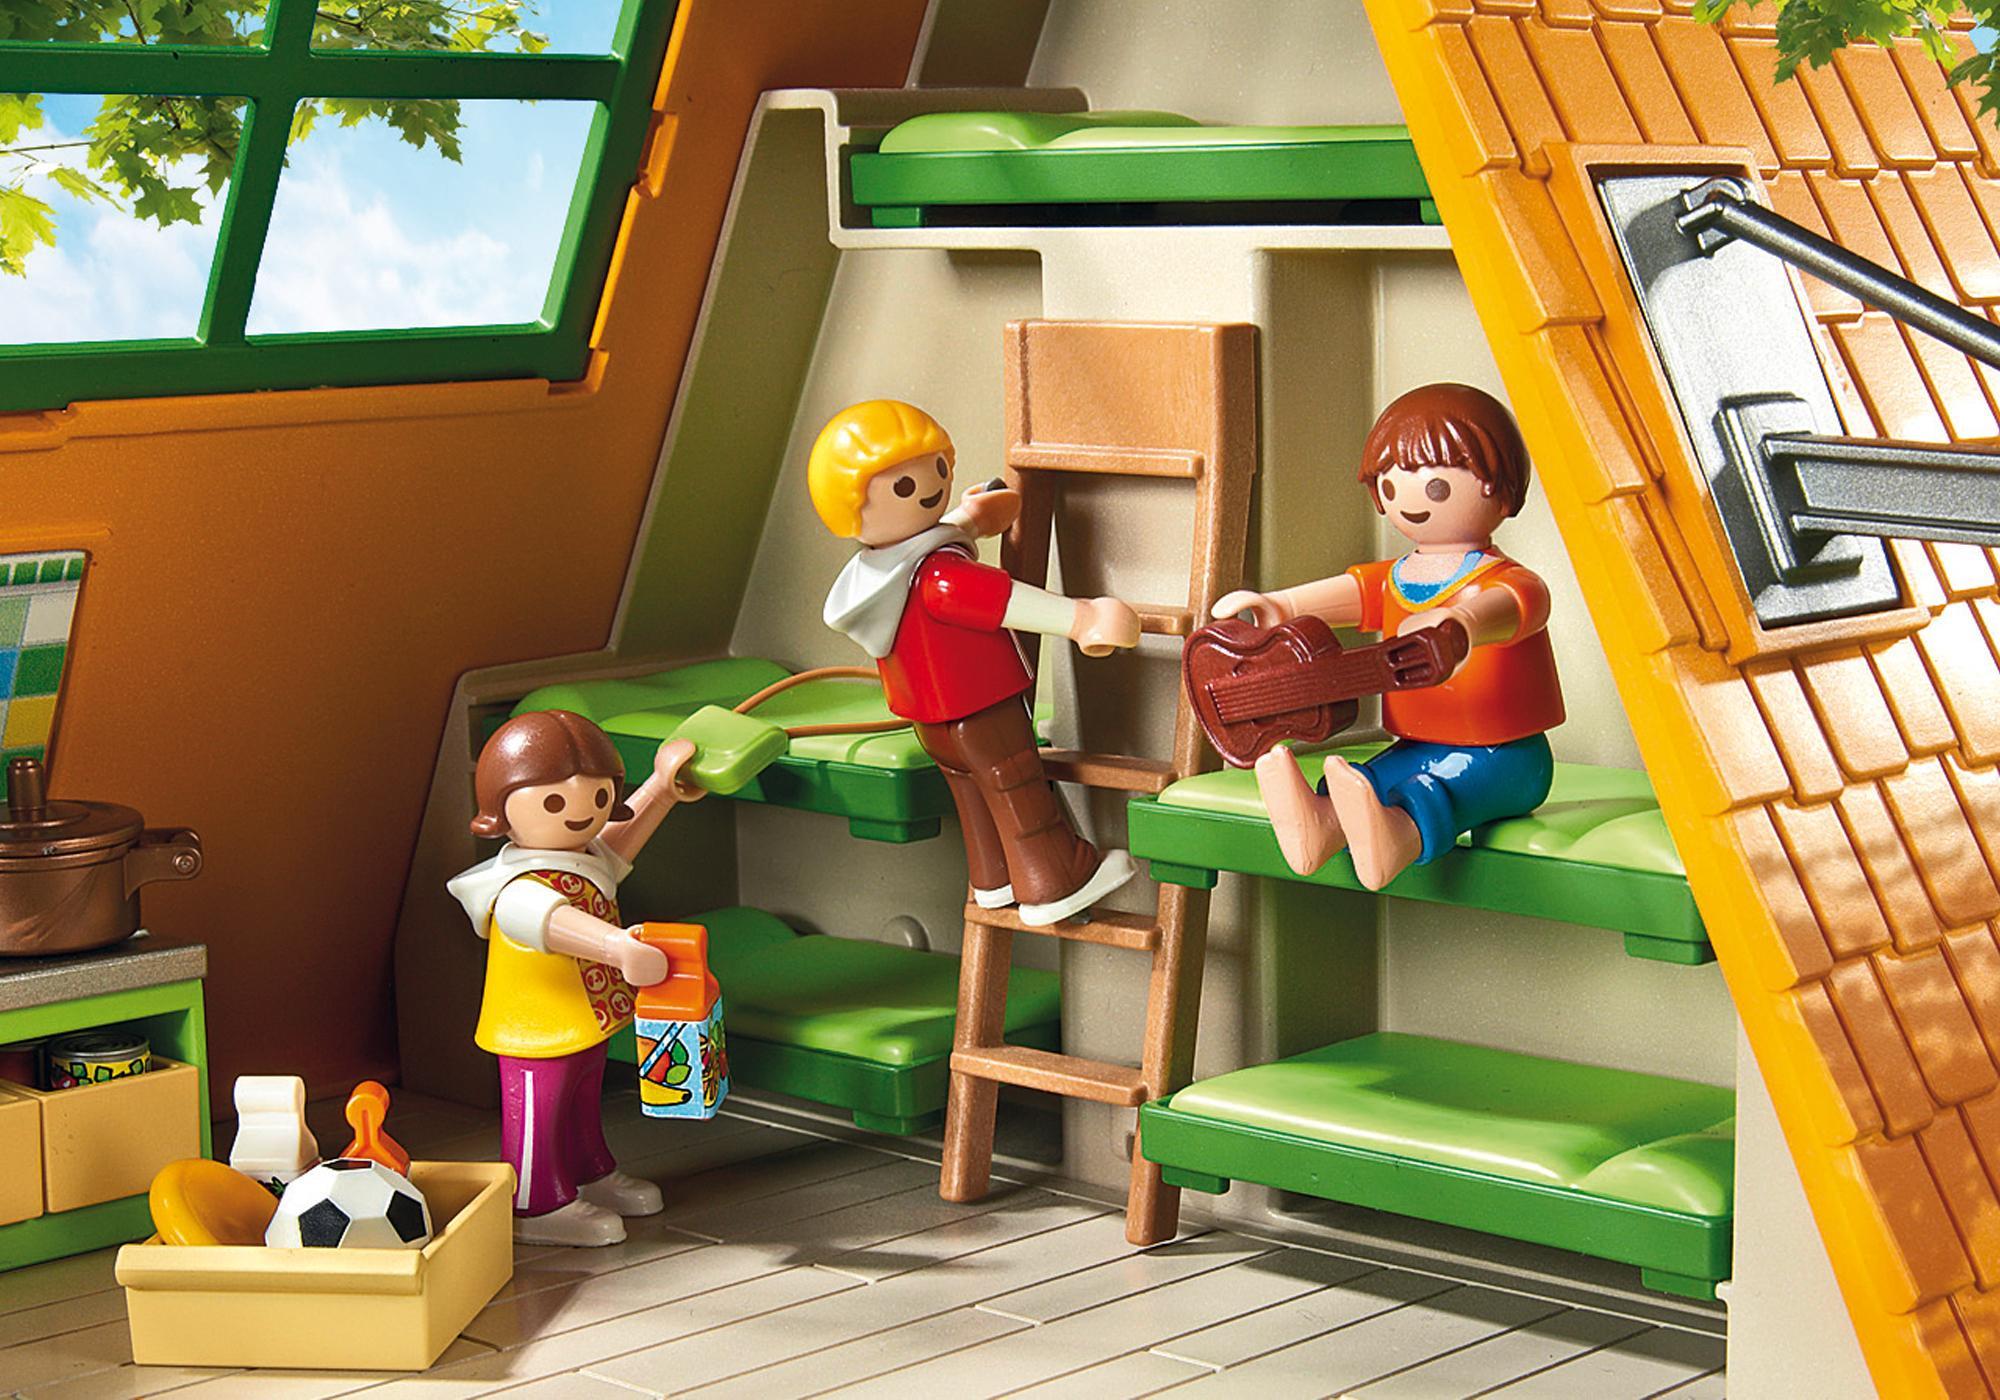 http://media.playmobil.com/i/playmobil/6887_product_extra2/Großes Feriencamp